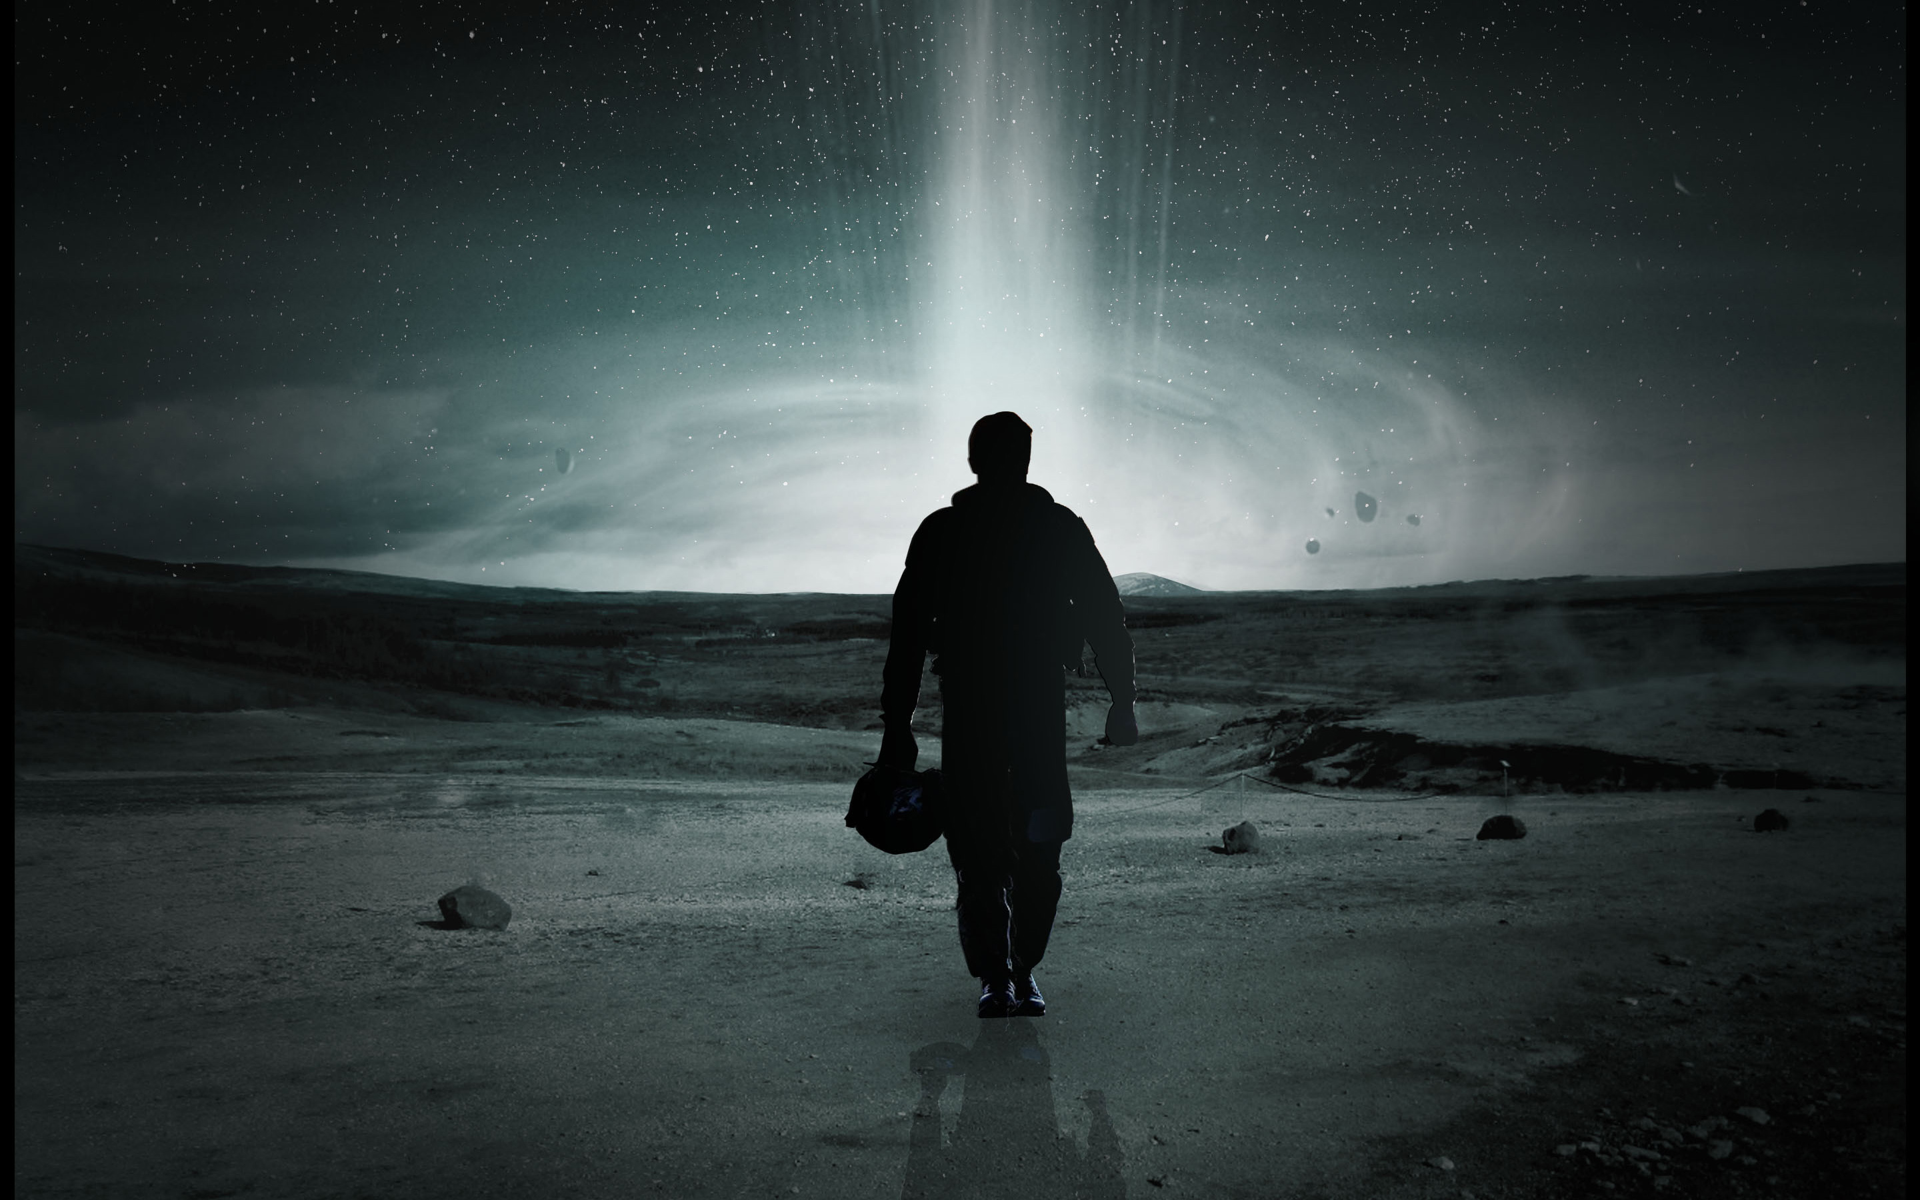 6a00d8341bfb1653ef01a511ba63de970c-christopher-nolan-s-interstellar-scientific-vision-makes-revolutionary-movie